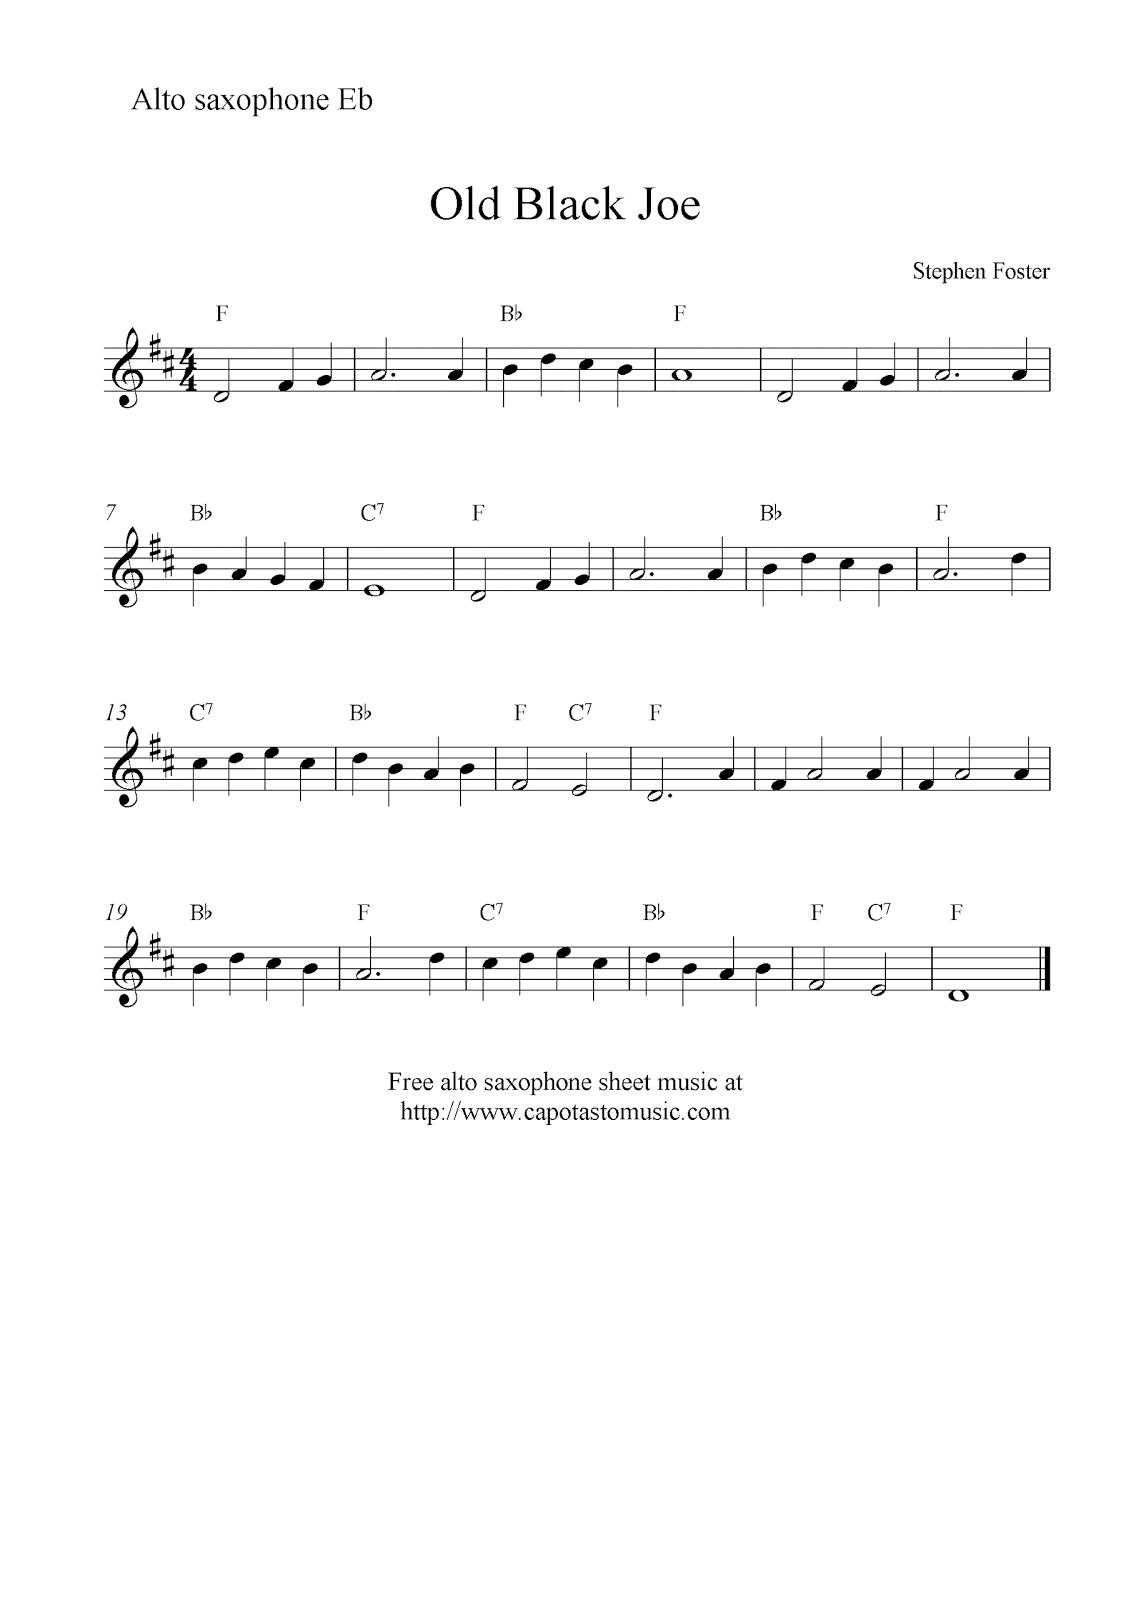 Old Black Joe, free alto saxophone sheet music notes